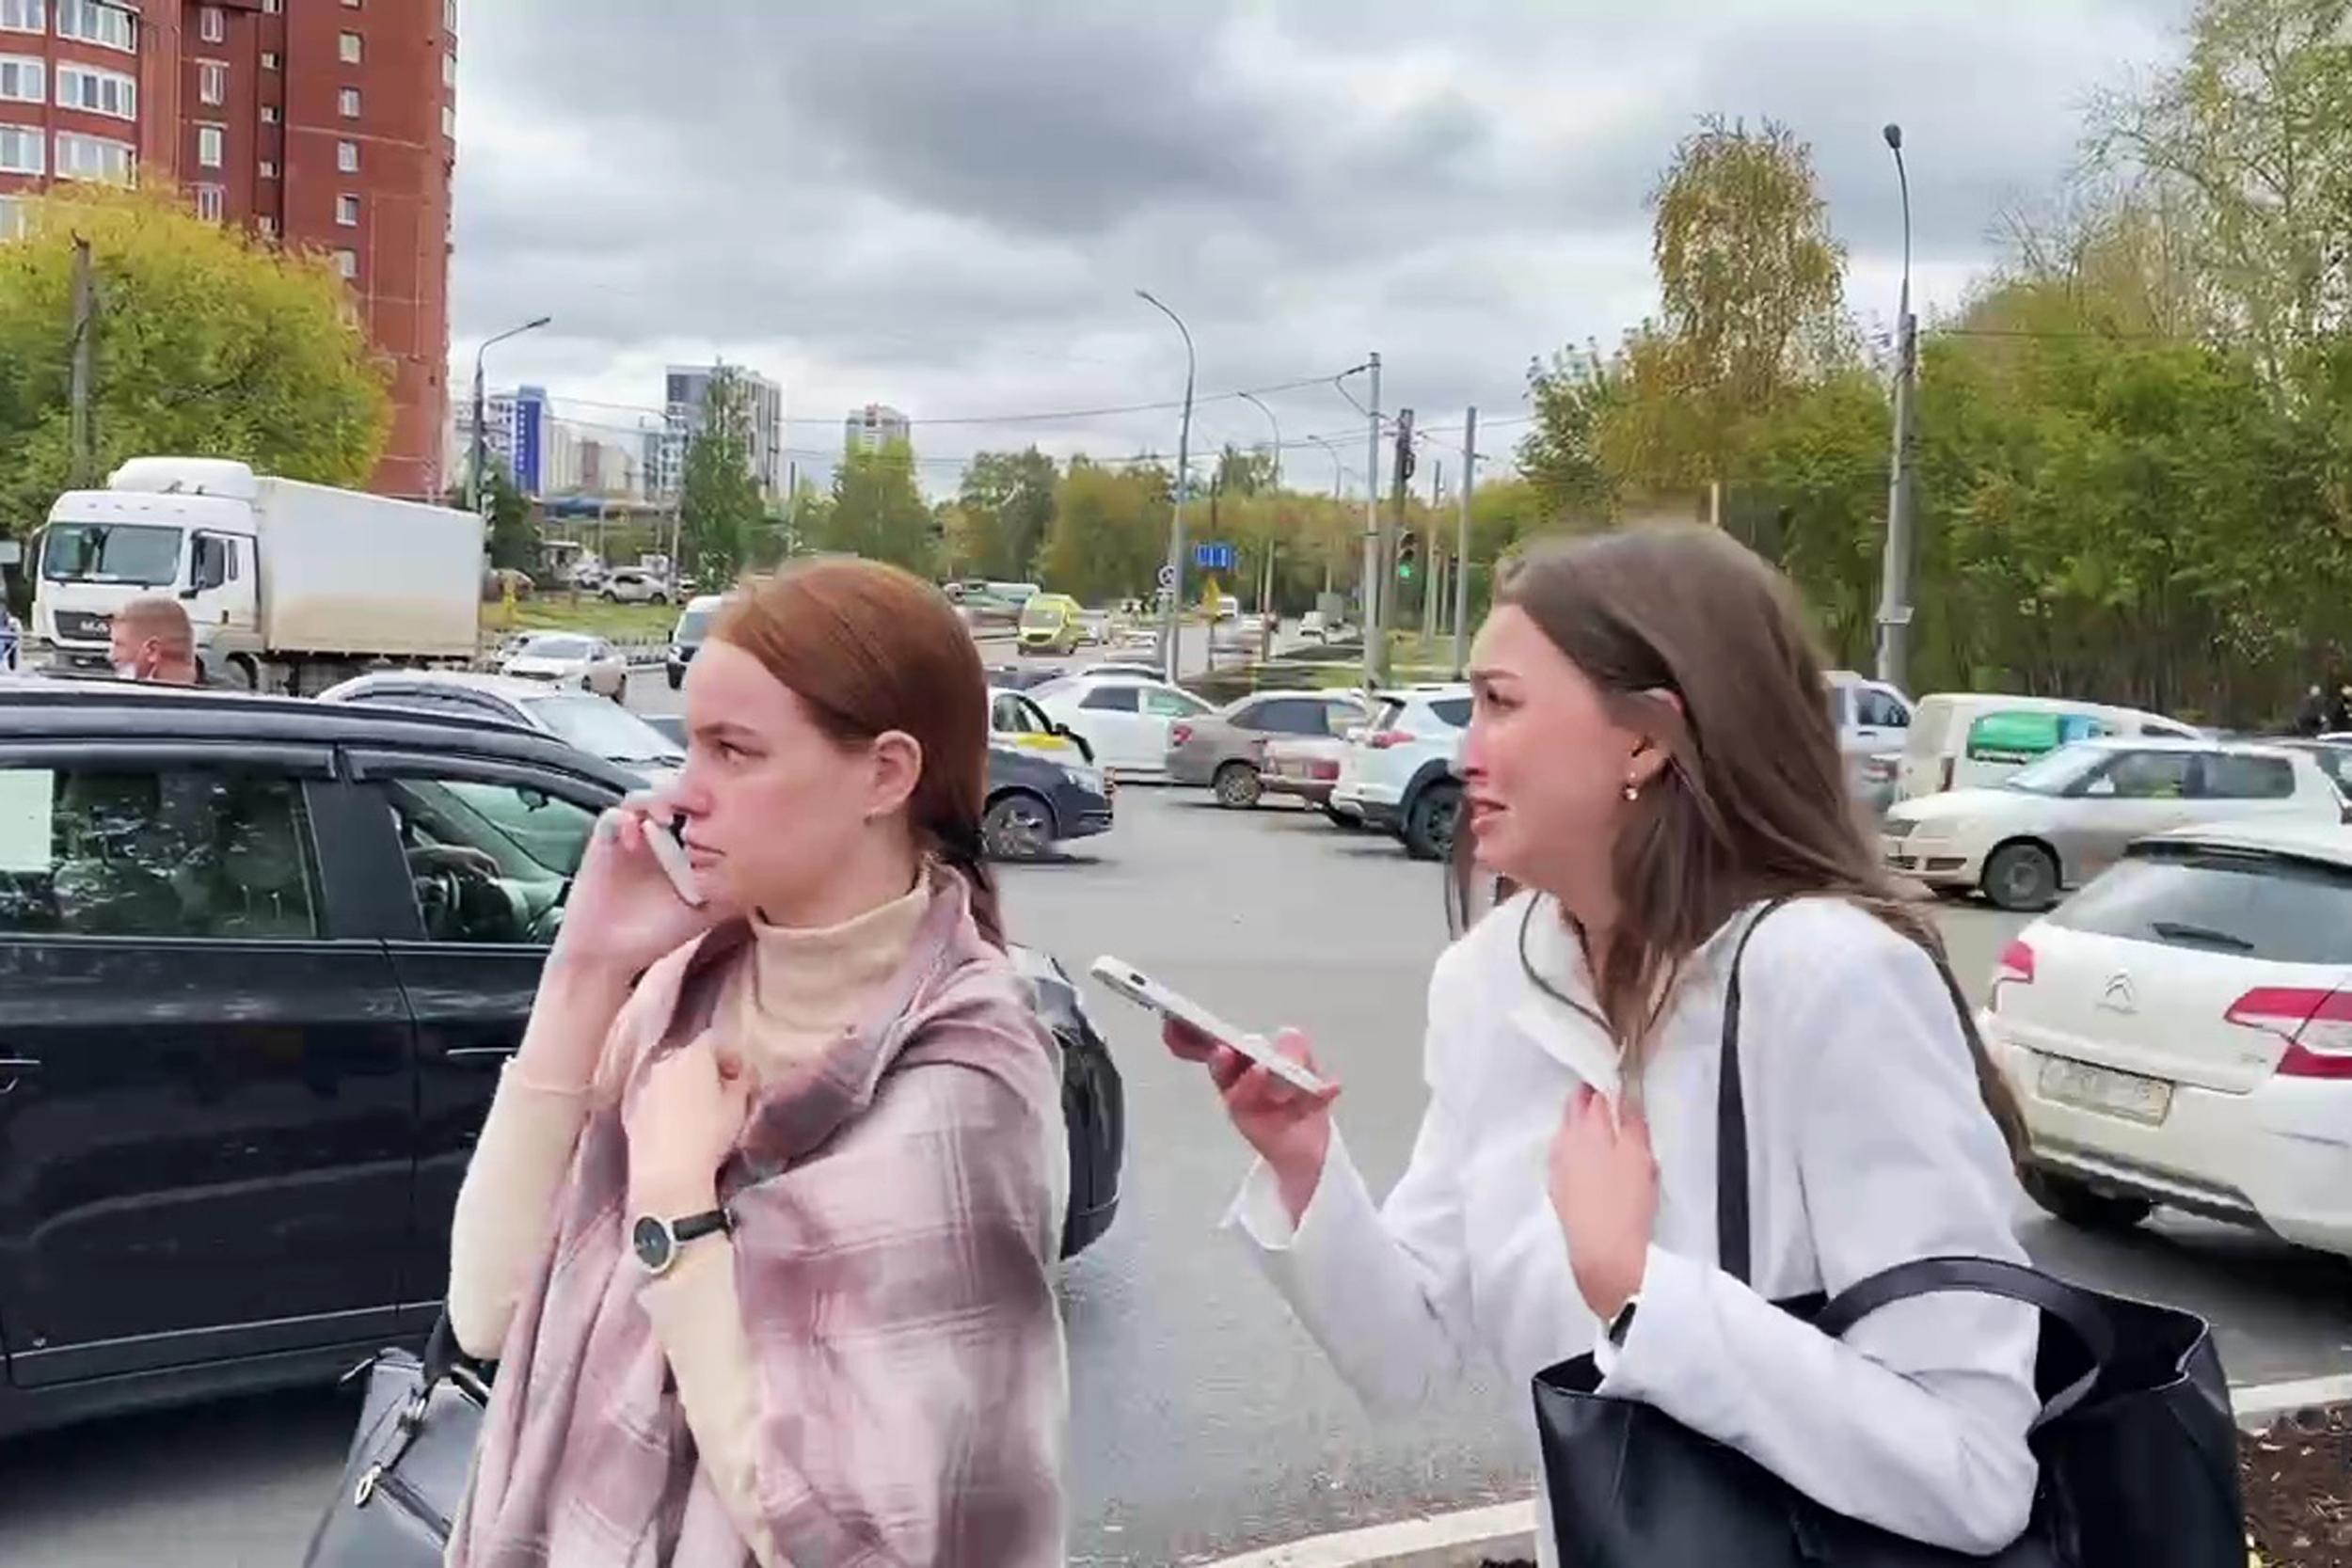 Gunman kills 8, injures 28 at Russian university